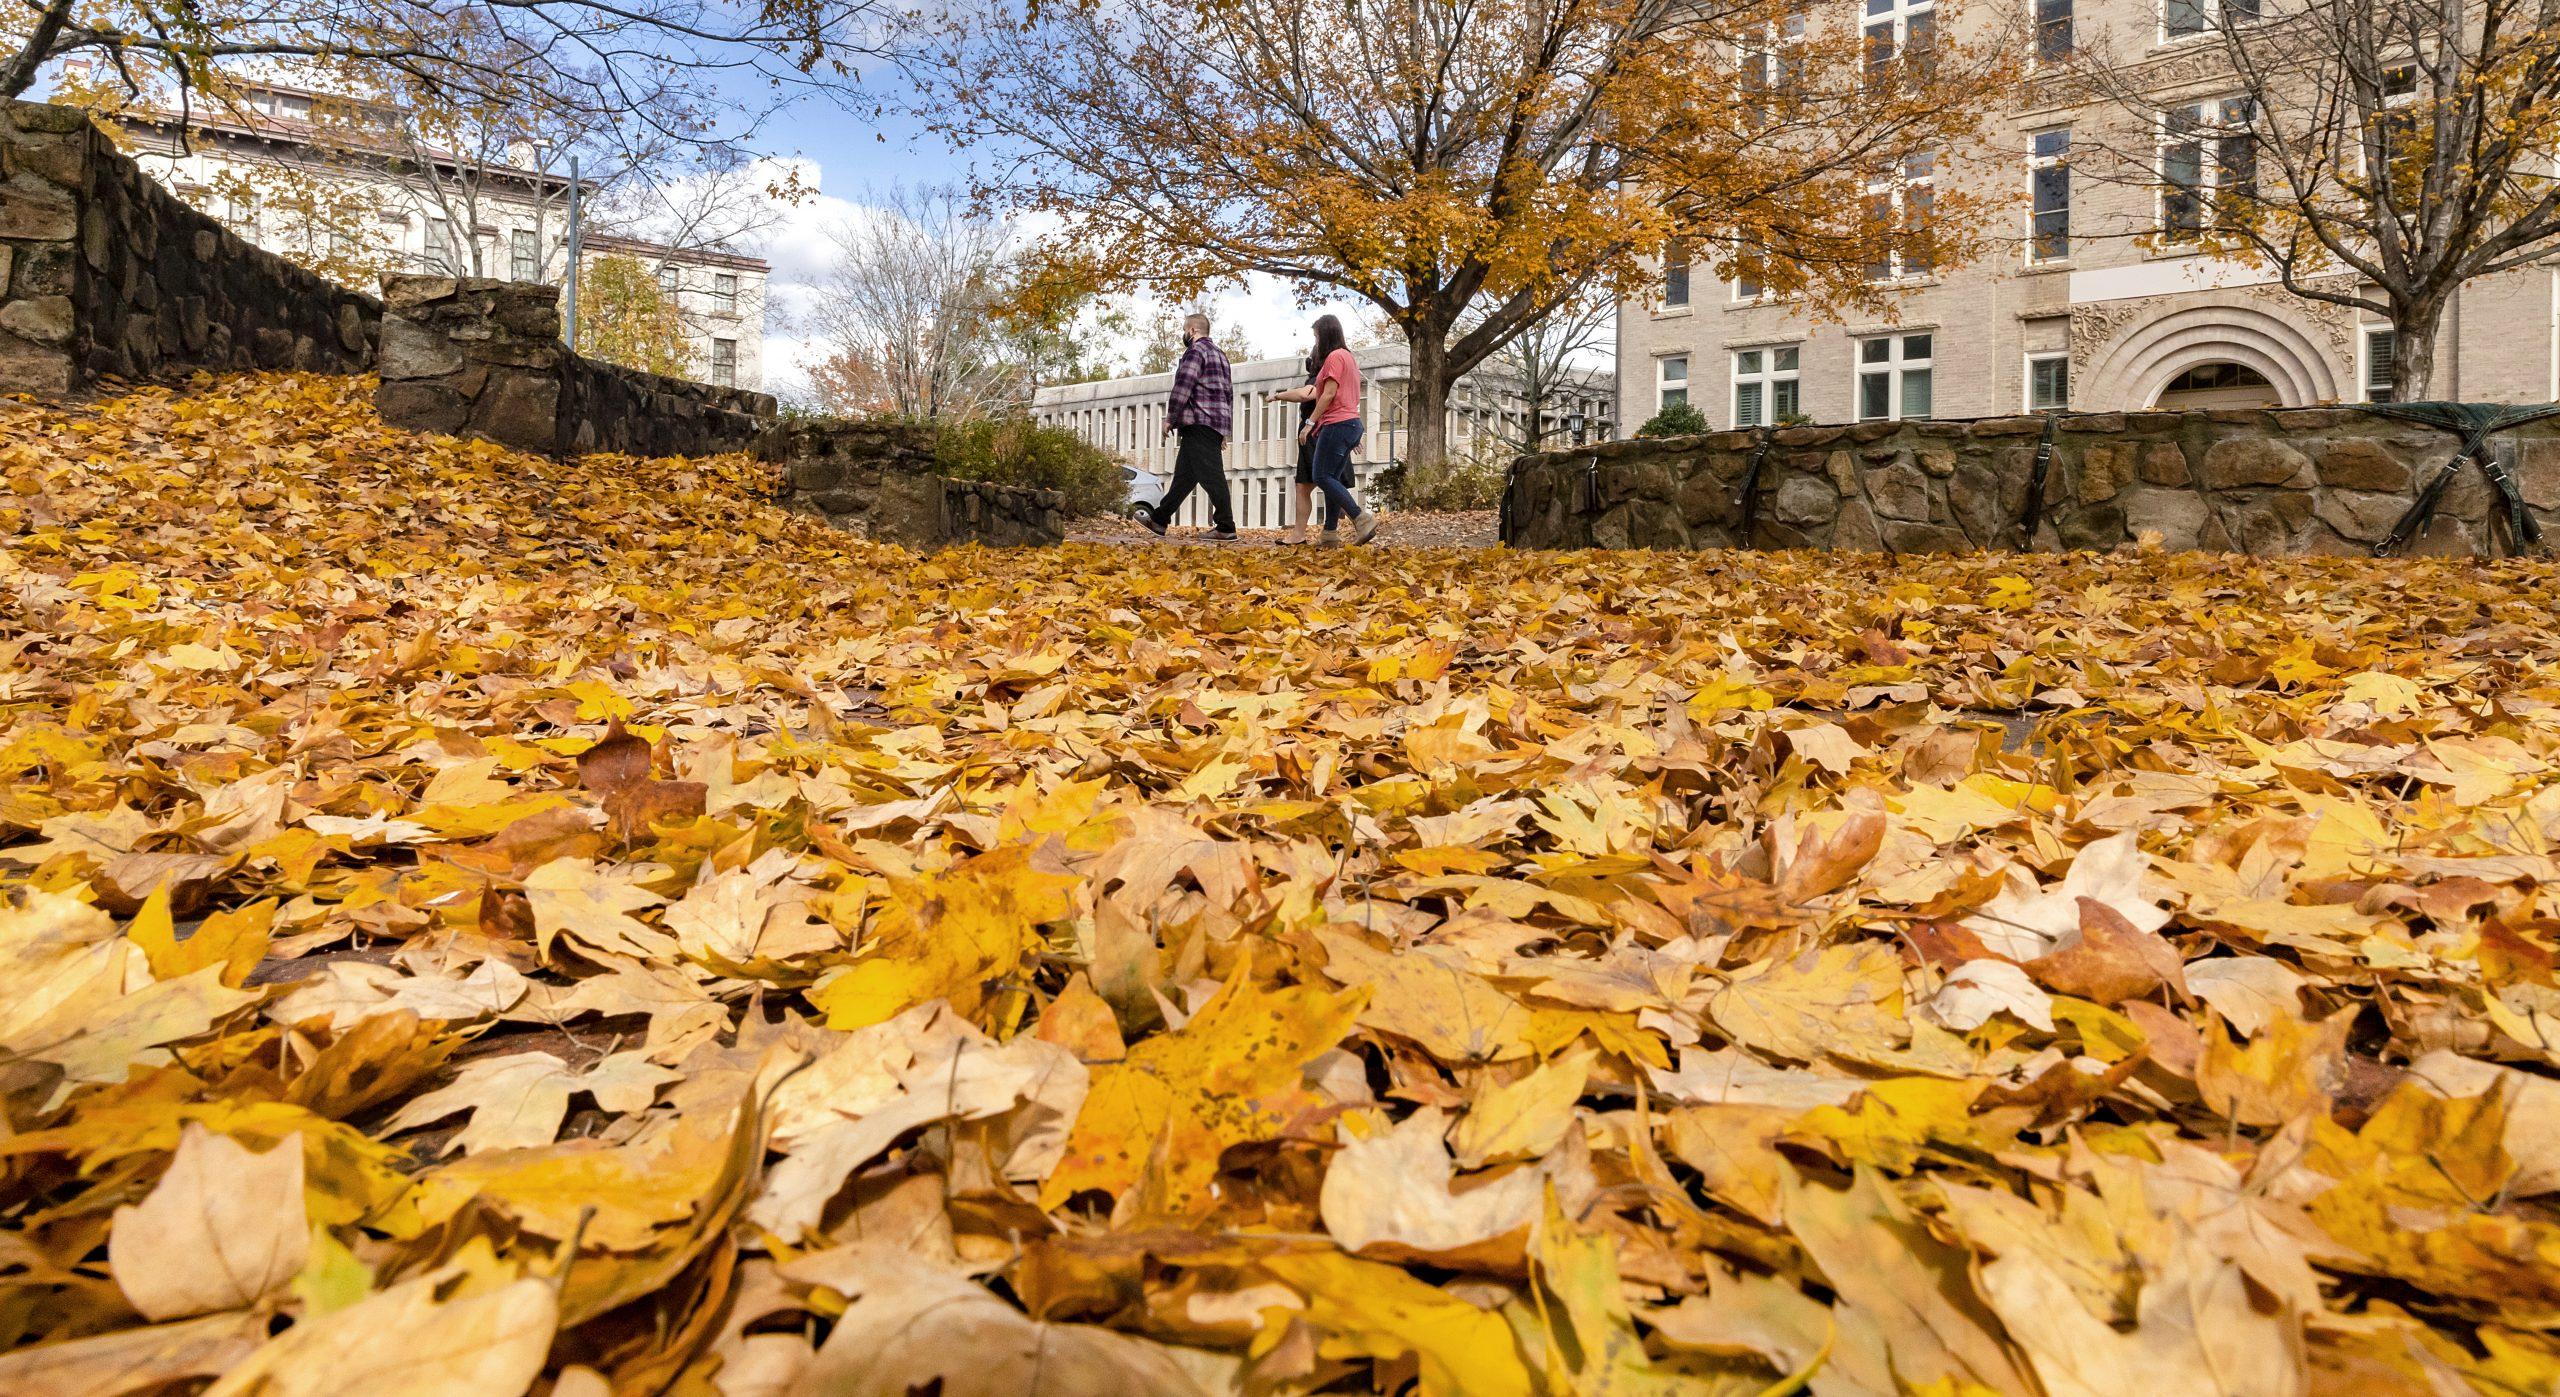 Fall leaves on campus sidewalk.